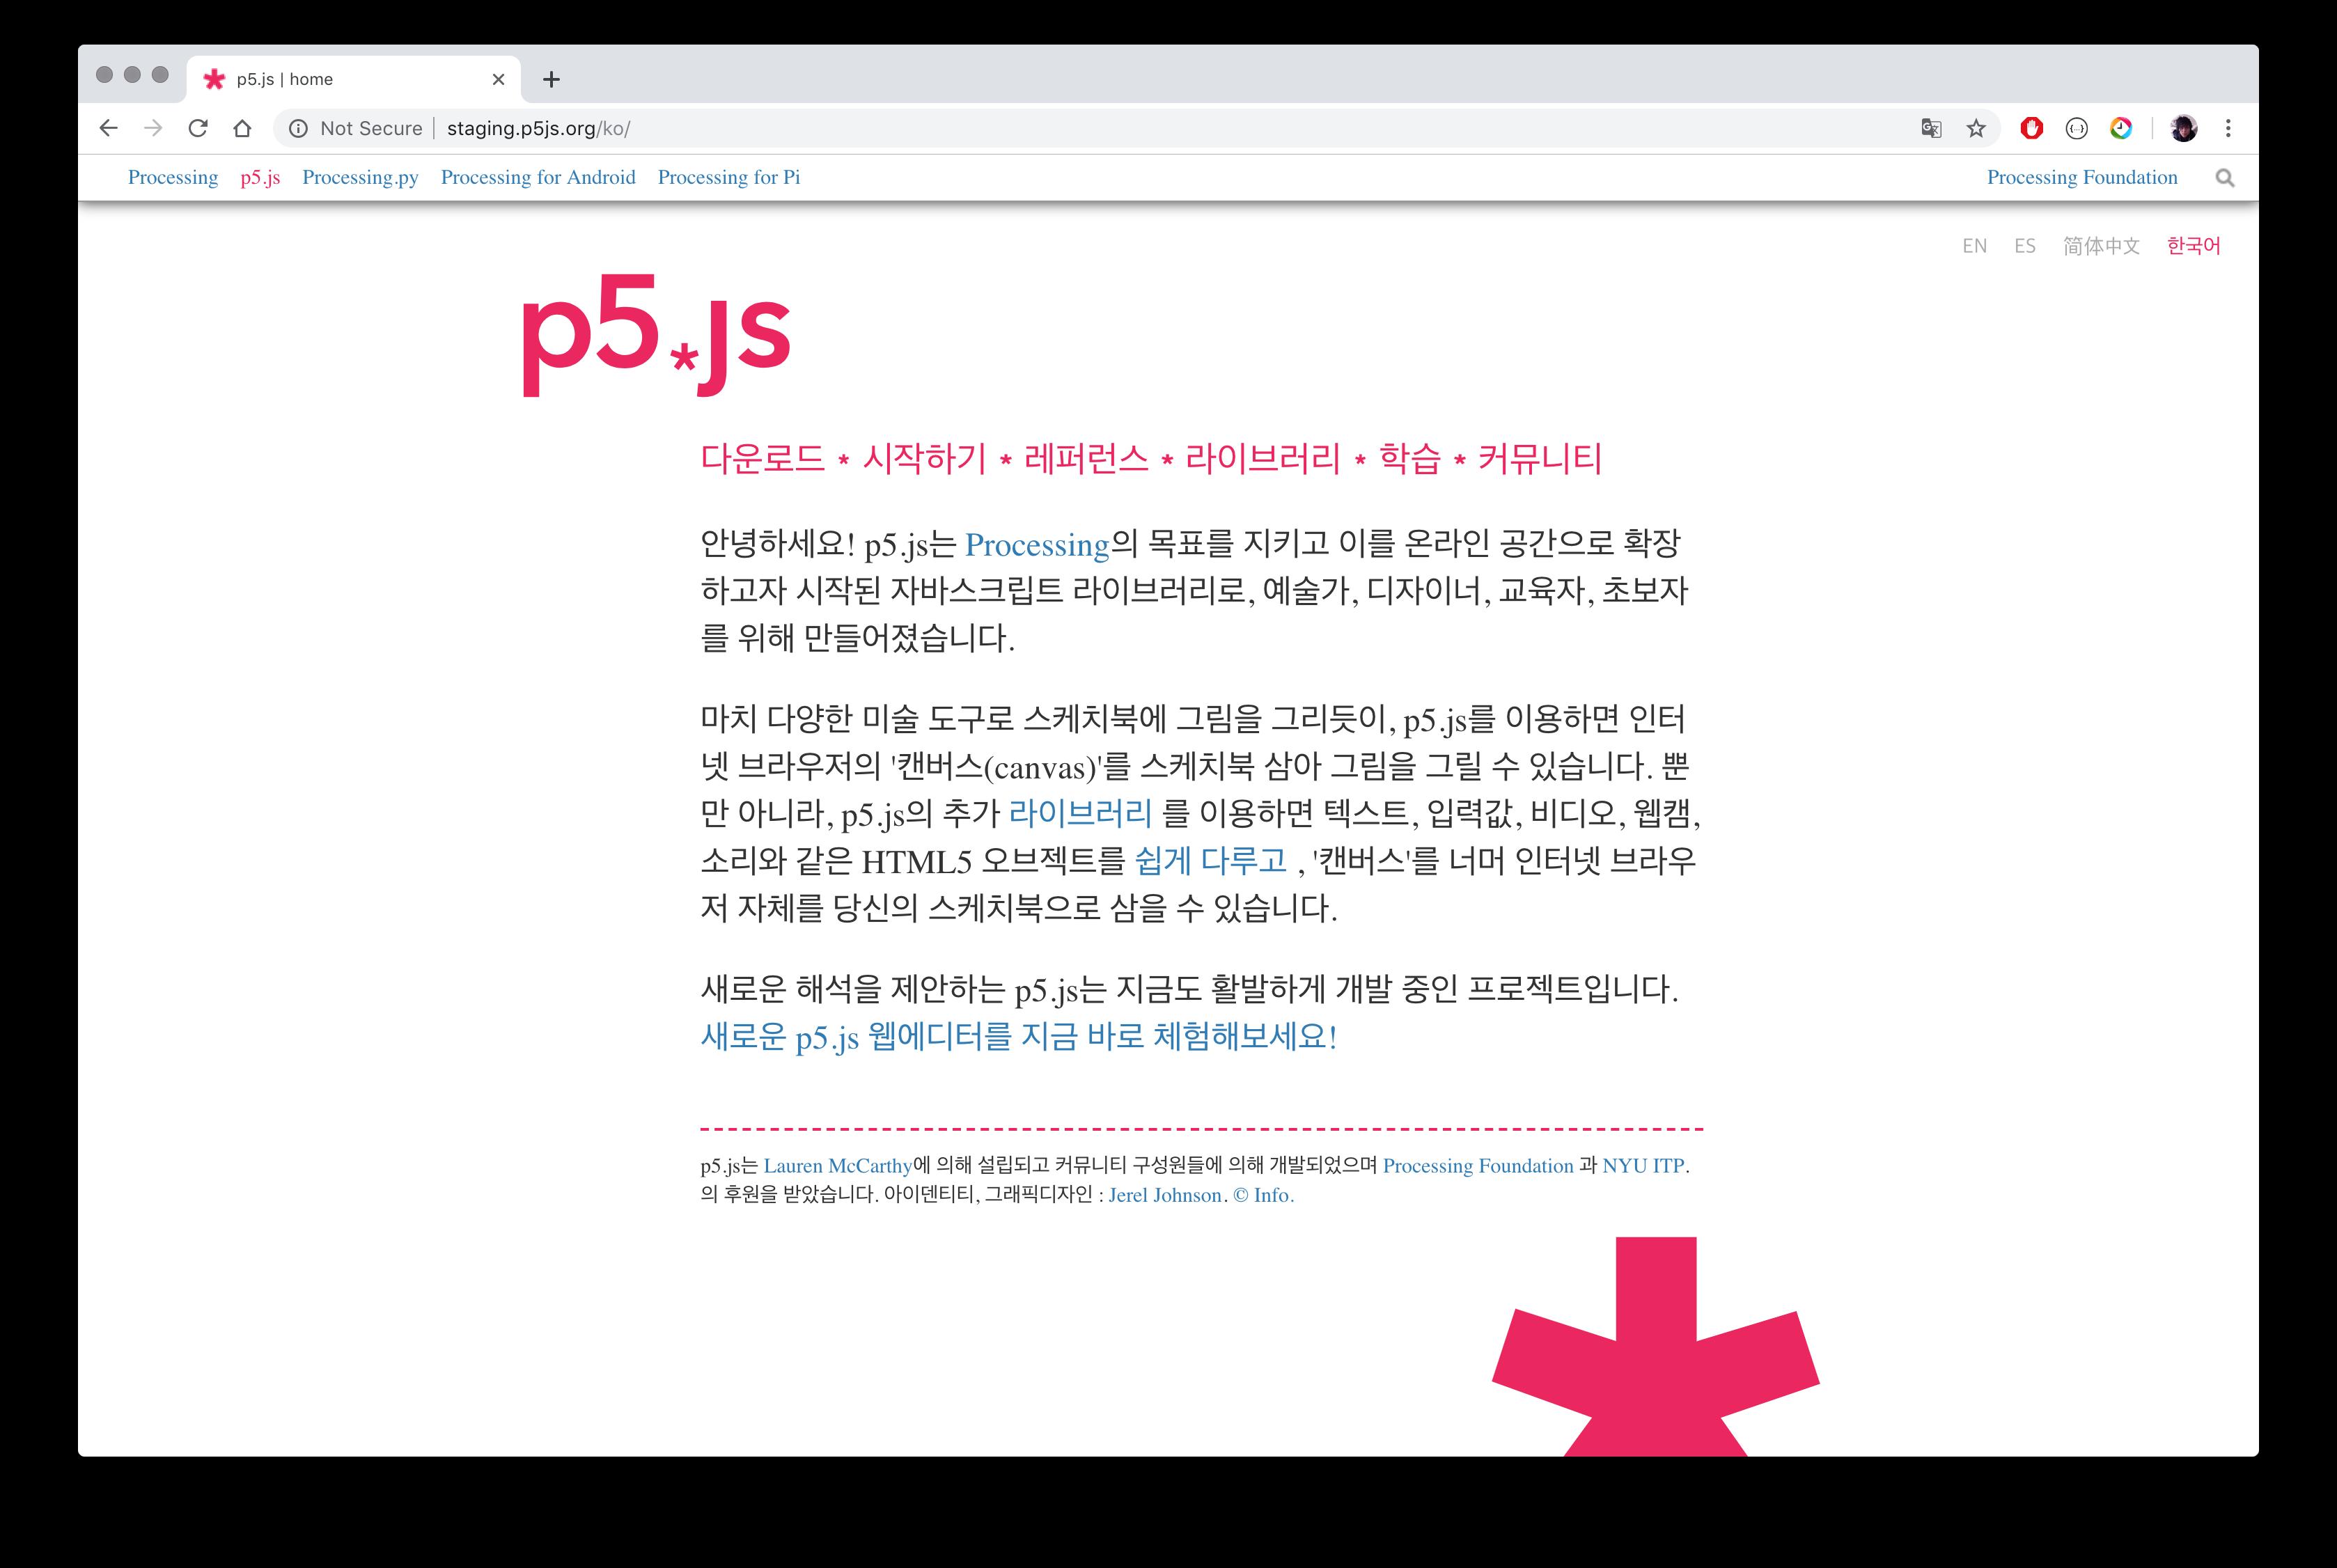 Screenshot of p5.js website in Korean language